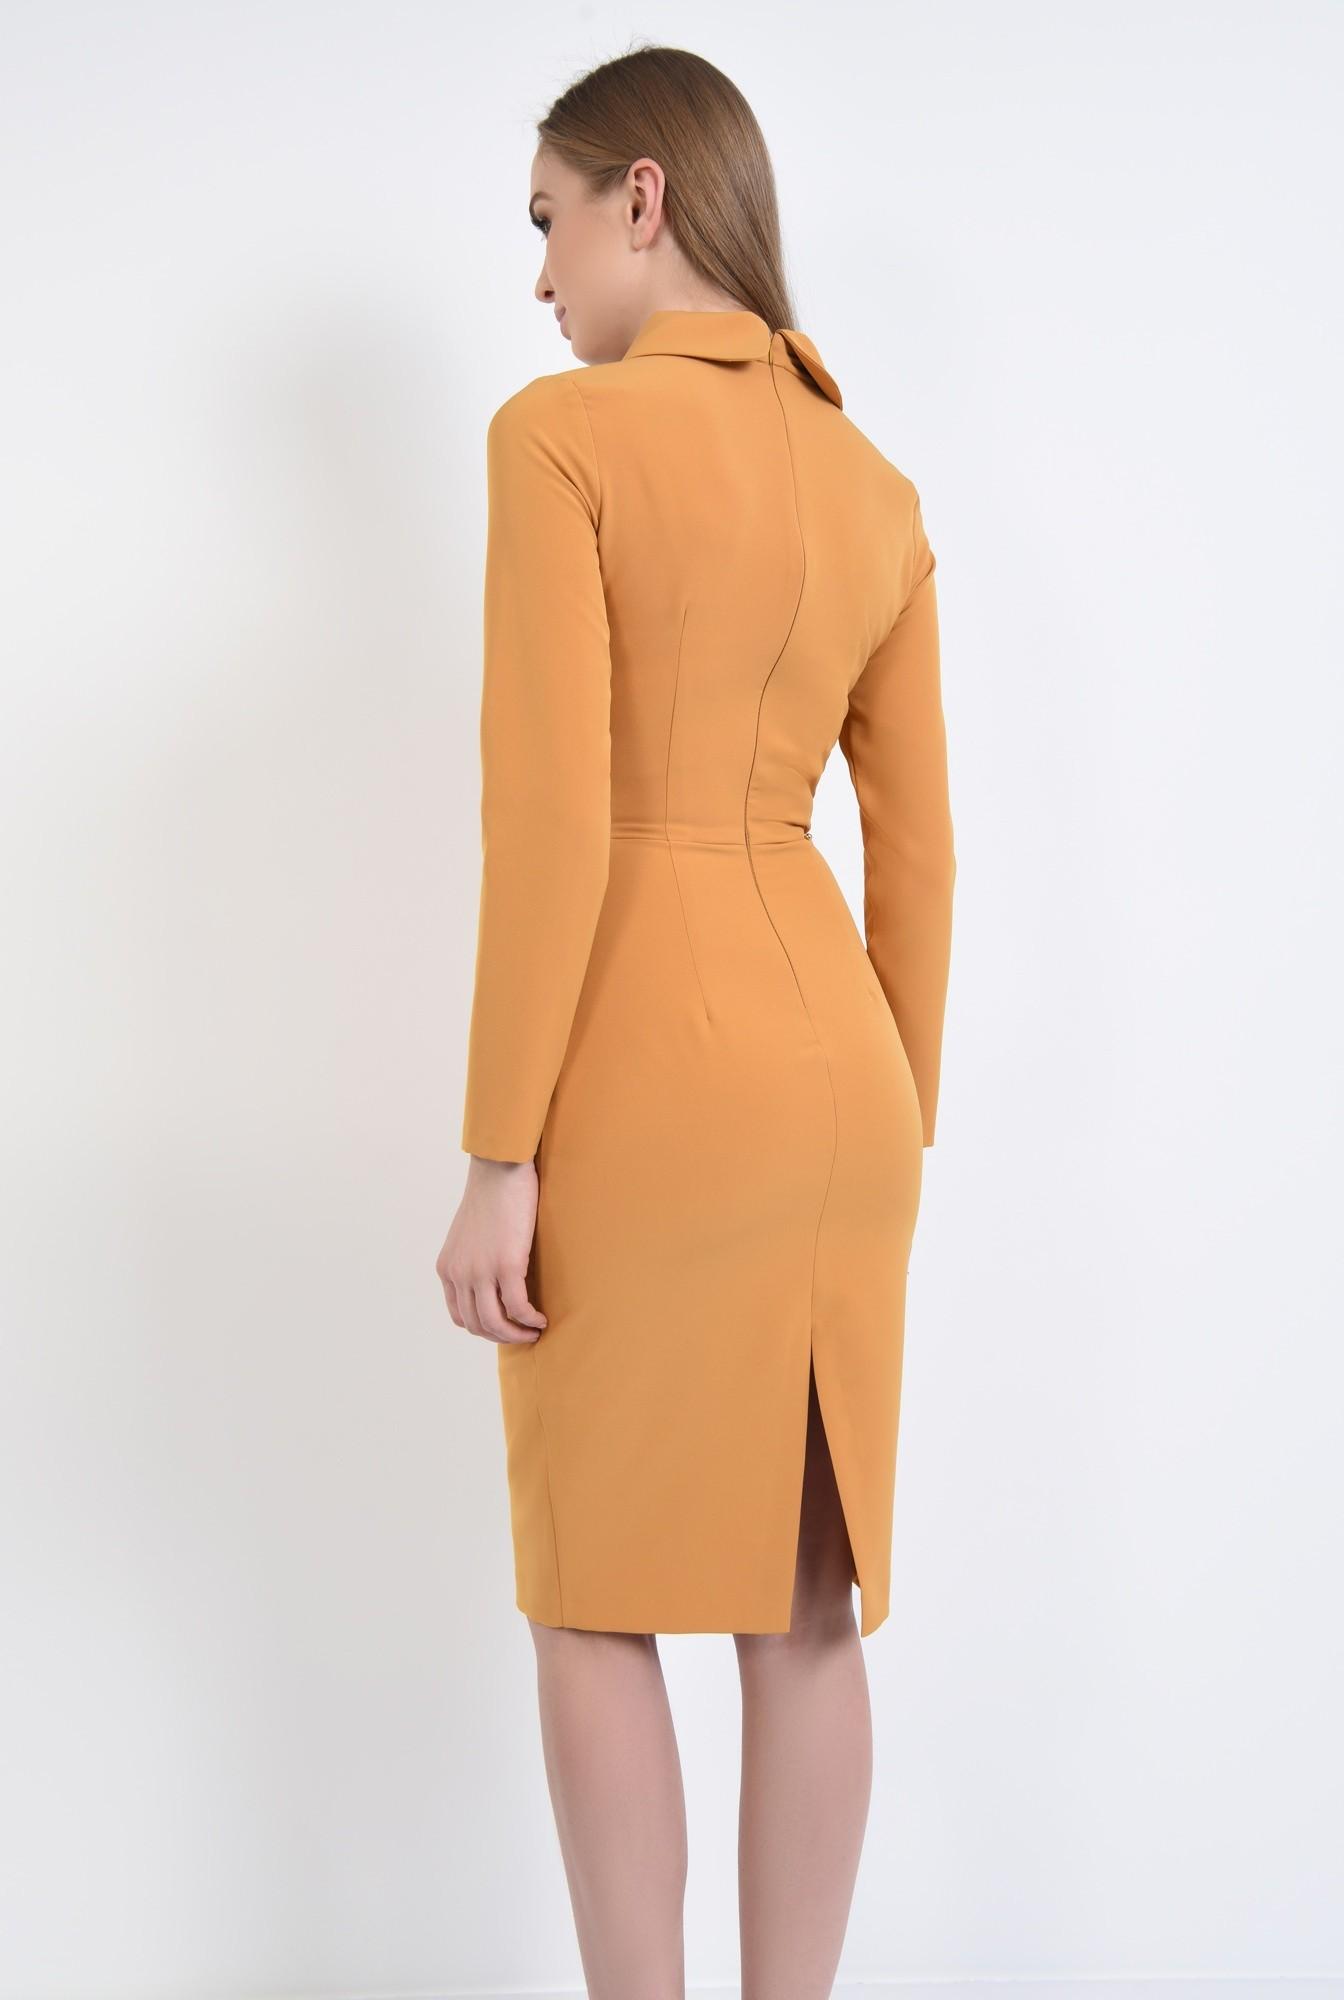 1 - rochie casual, galben, mustar, maneci lungi, guler, funda